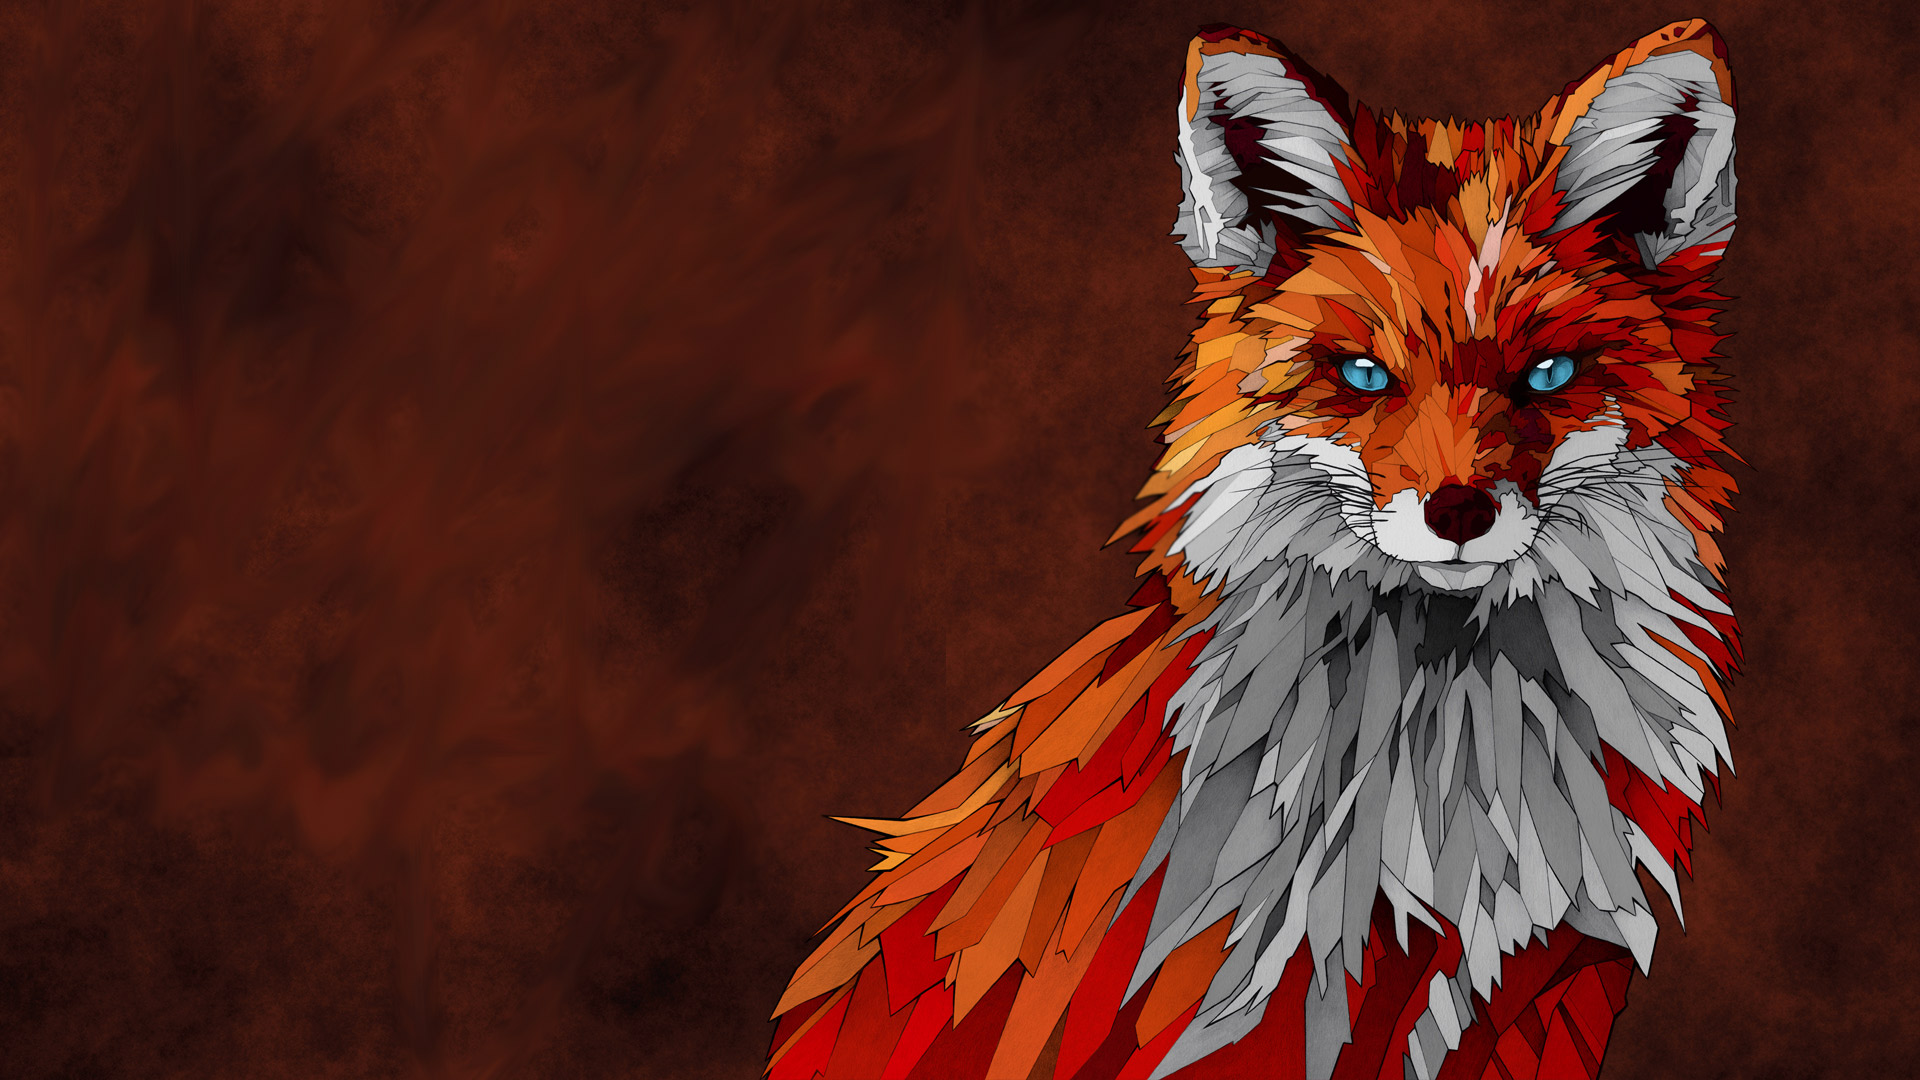 Fox Artwork HD Artist 4k Wallpapers Images Backgrounds